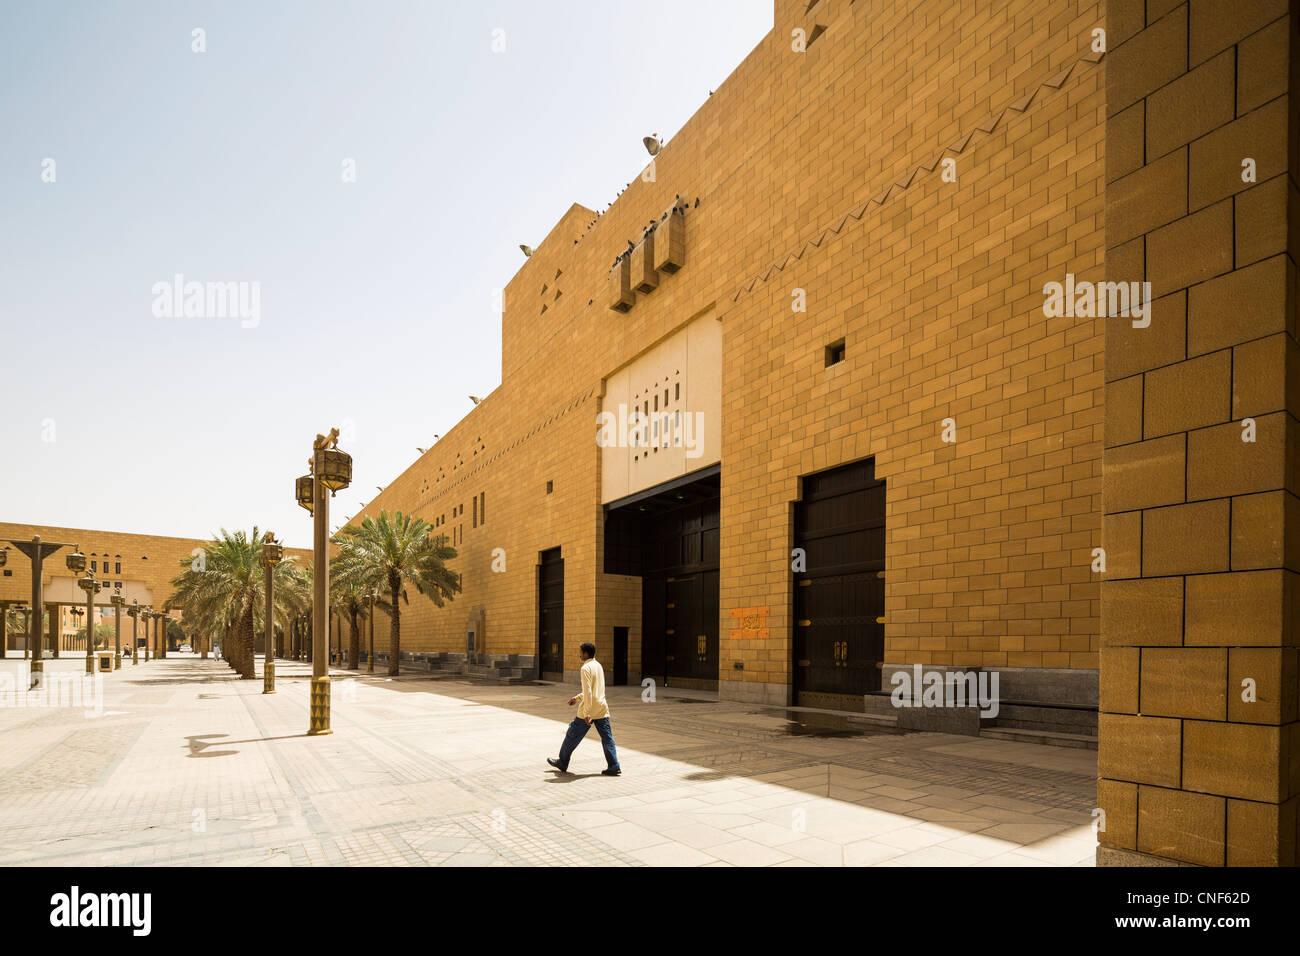 Qasr al-Hukm al-Dira, Riyadh, Arabia Saudita Imagen De Stock